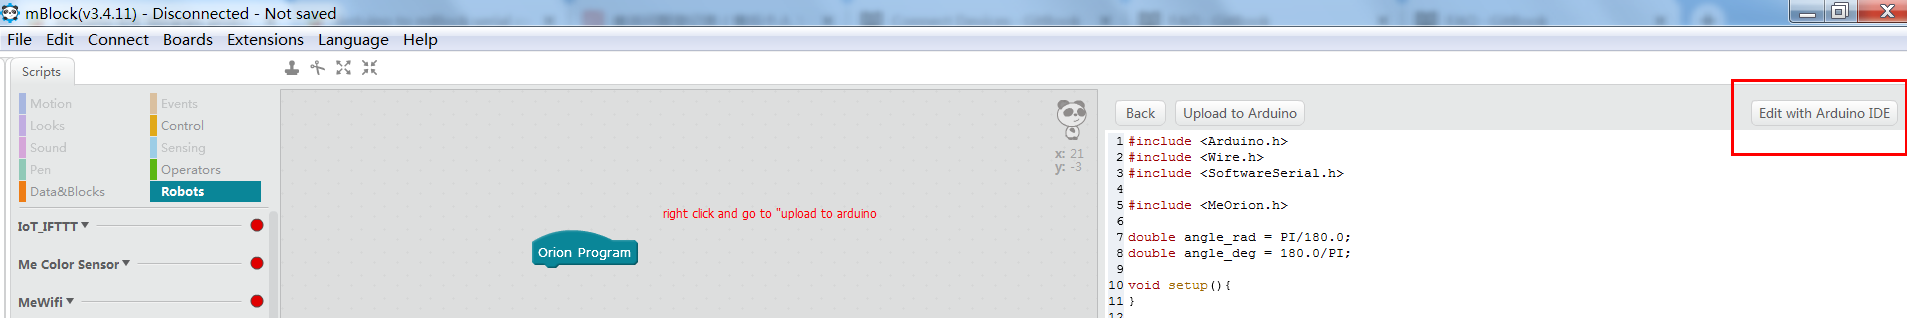 Arduino IDE libraries problem (mbot) - Software - Makeblock Forum